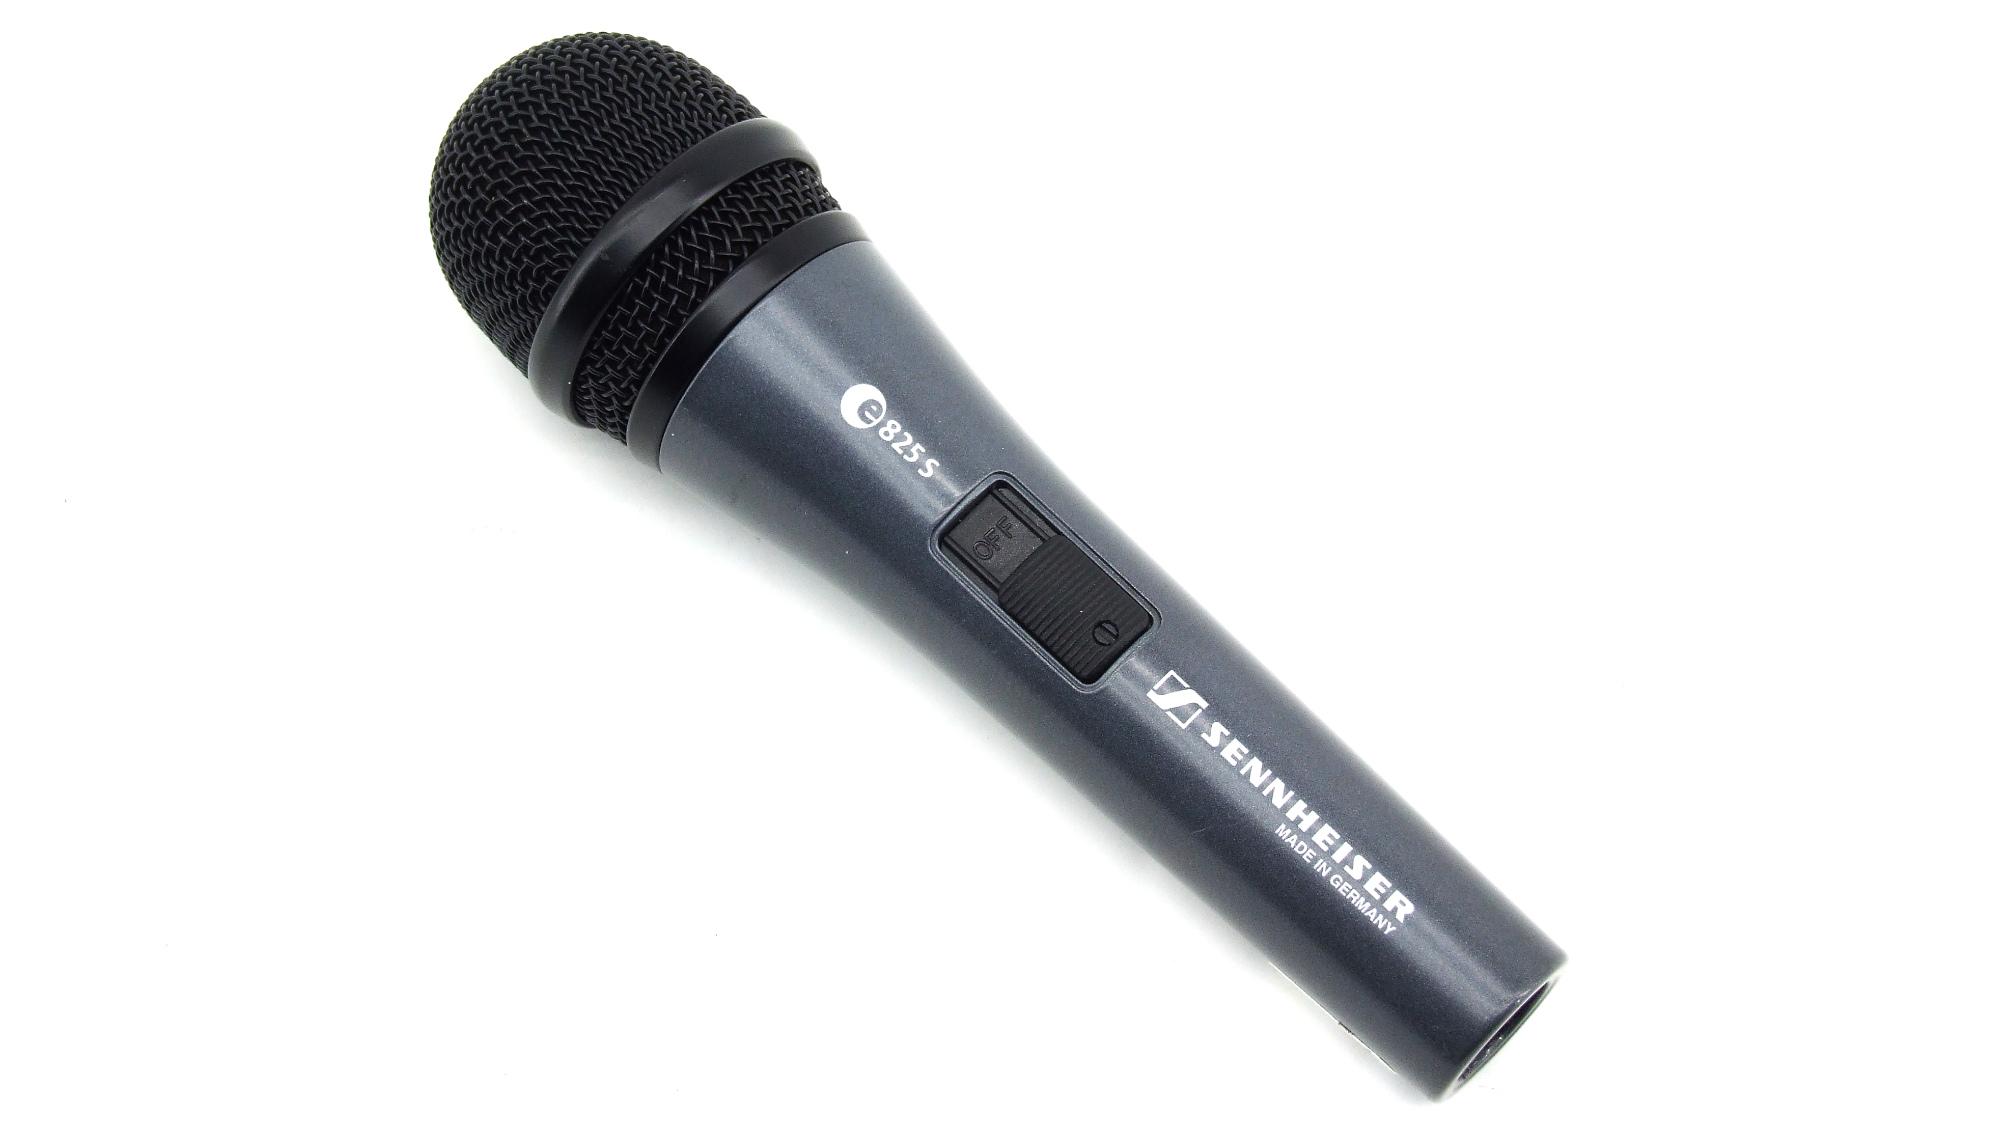 Sennheiser Mikrofon leihen